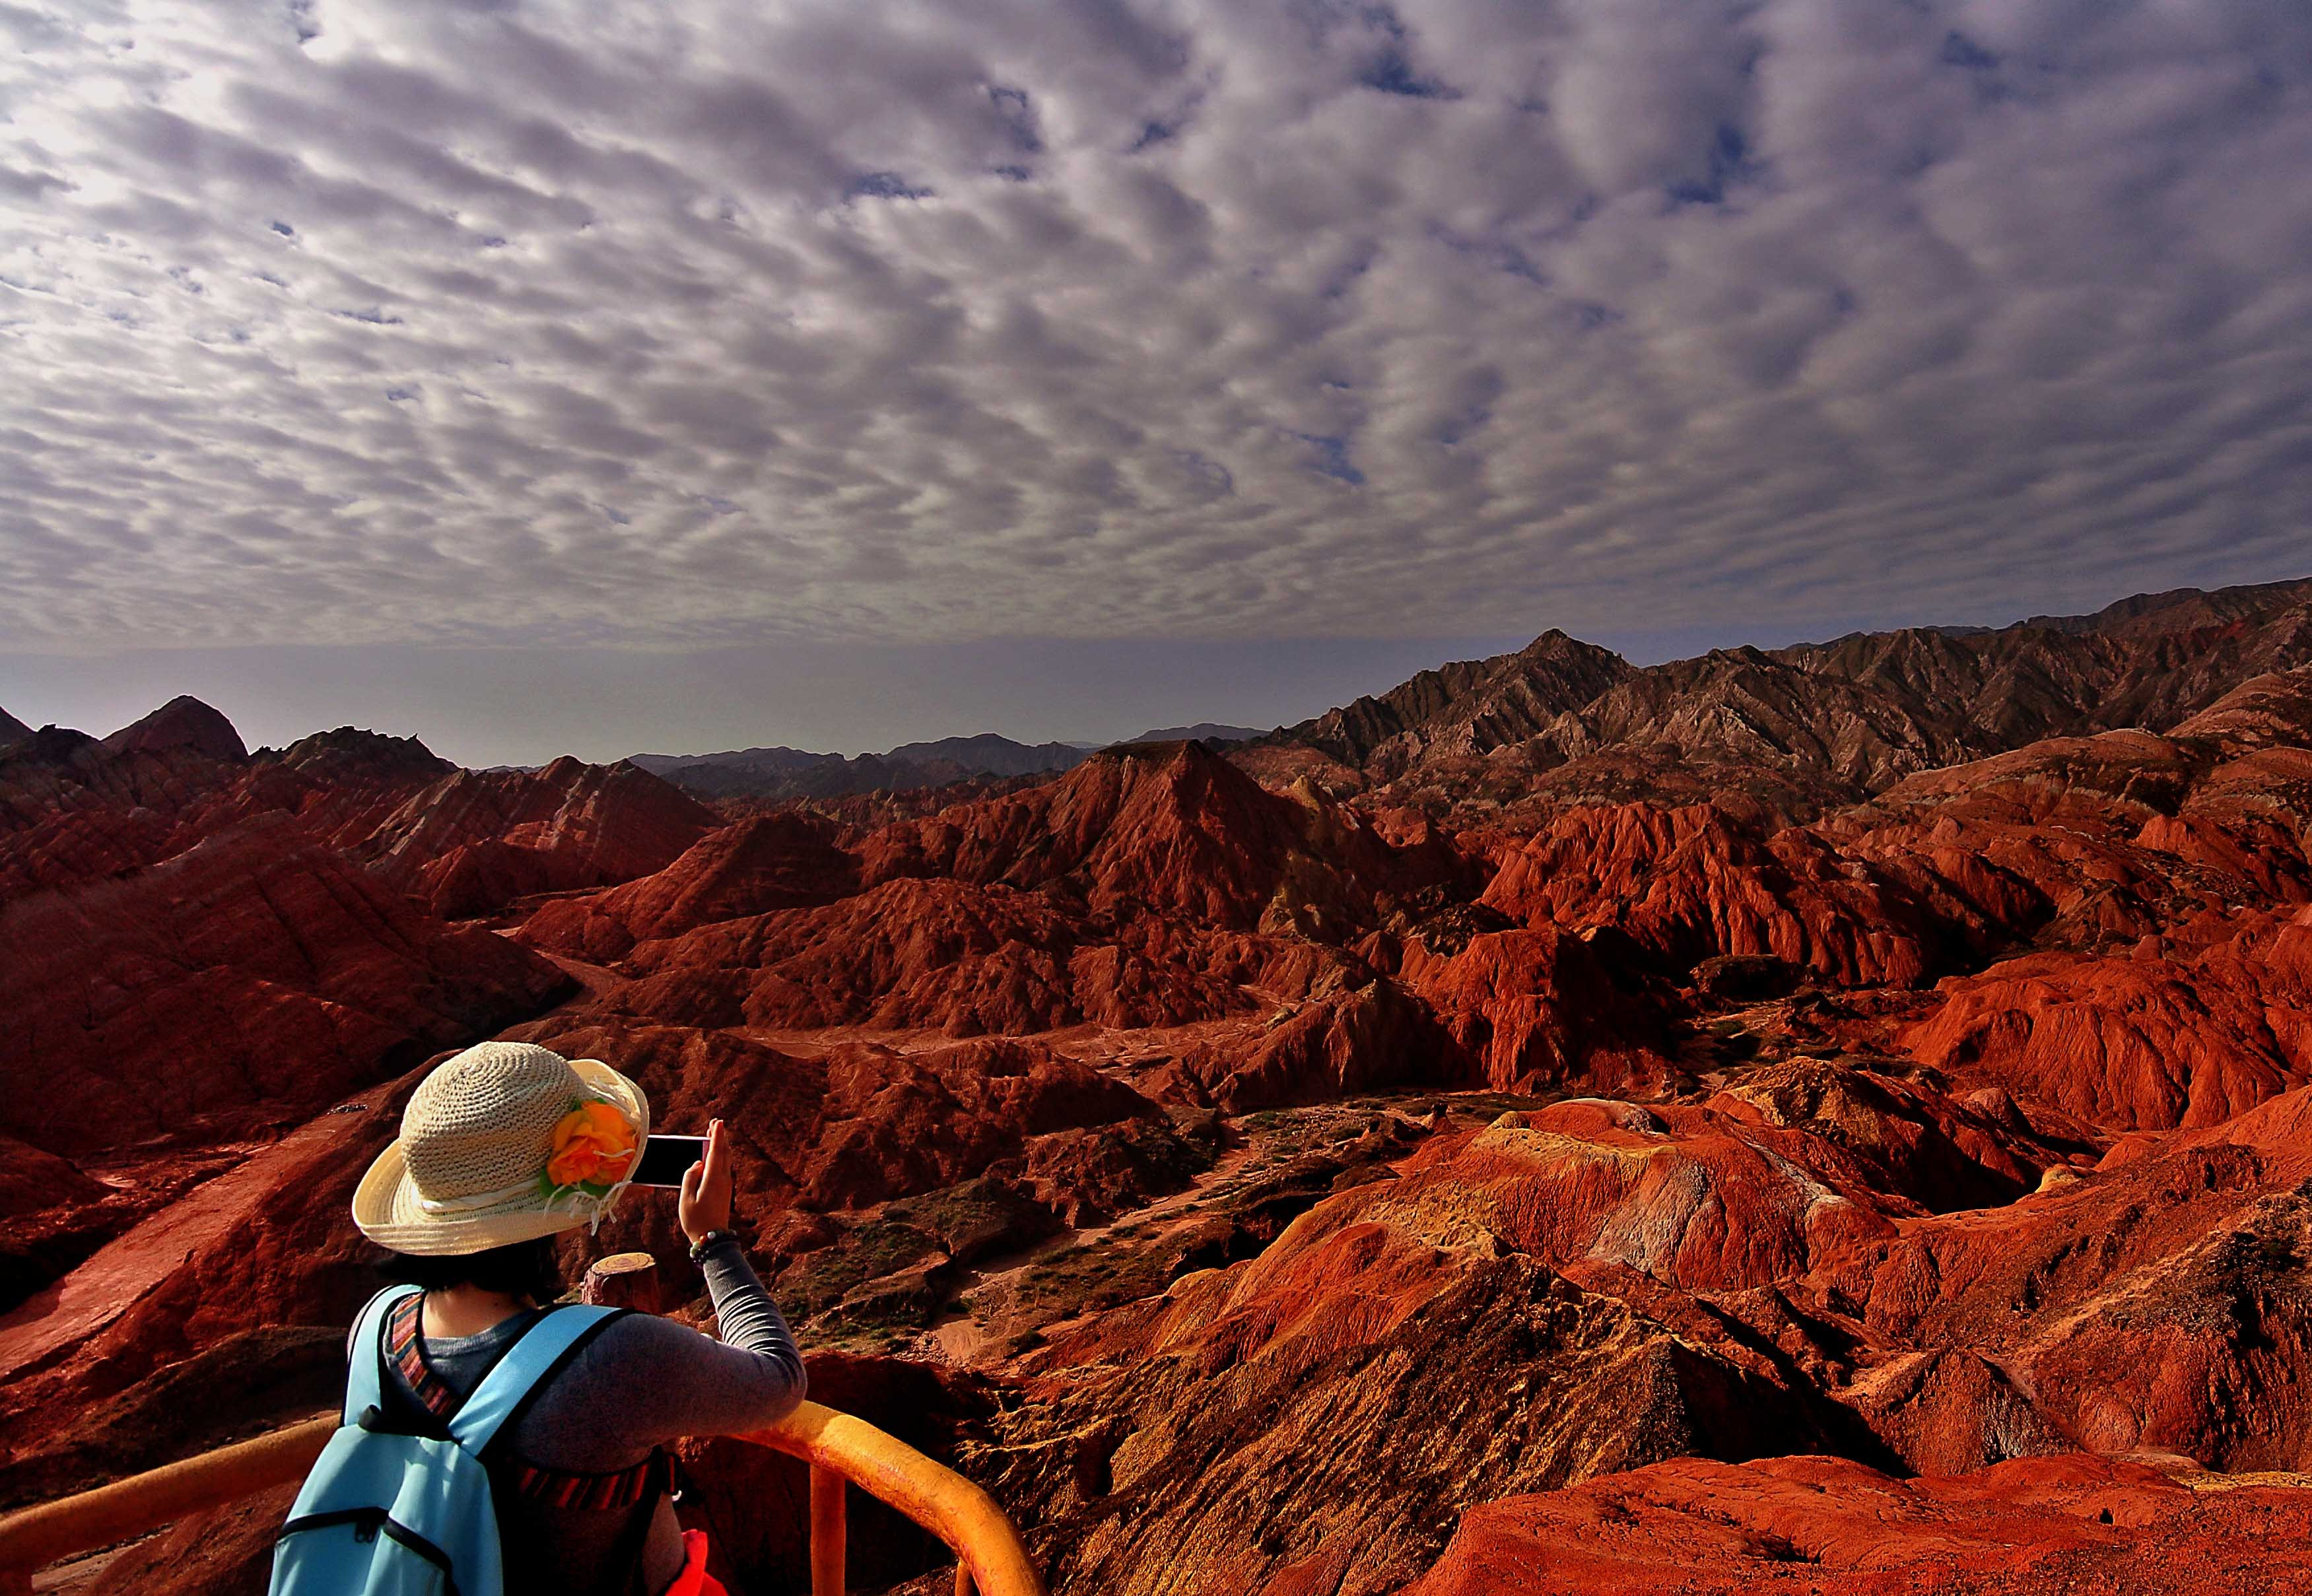 A visitor takes photos at Zhangye Danxia Landform Geological Park in Zhangye City, Gansu Province, northwest China, July 7, 2014.